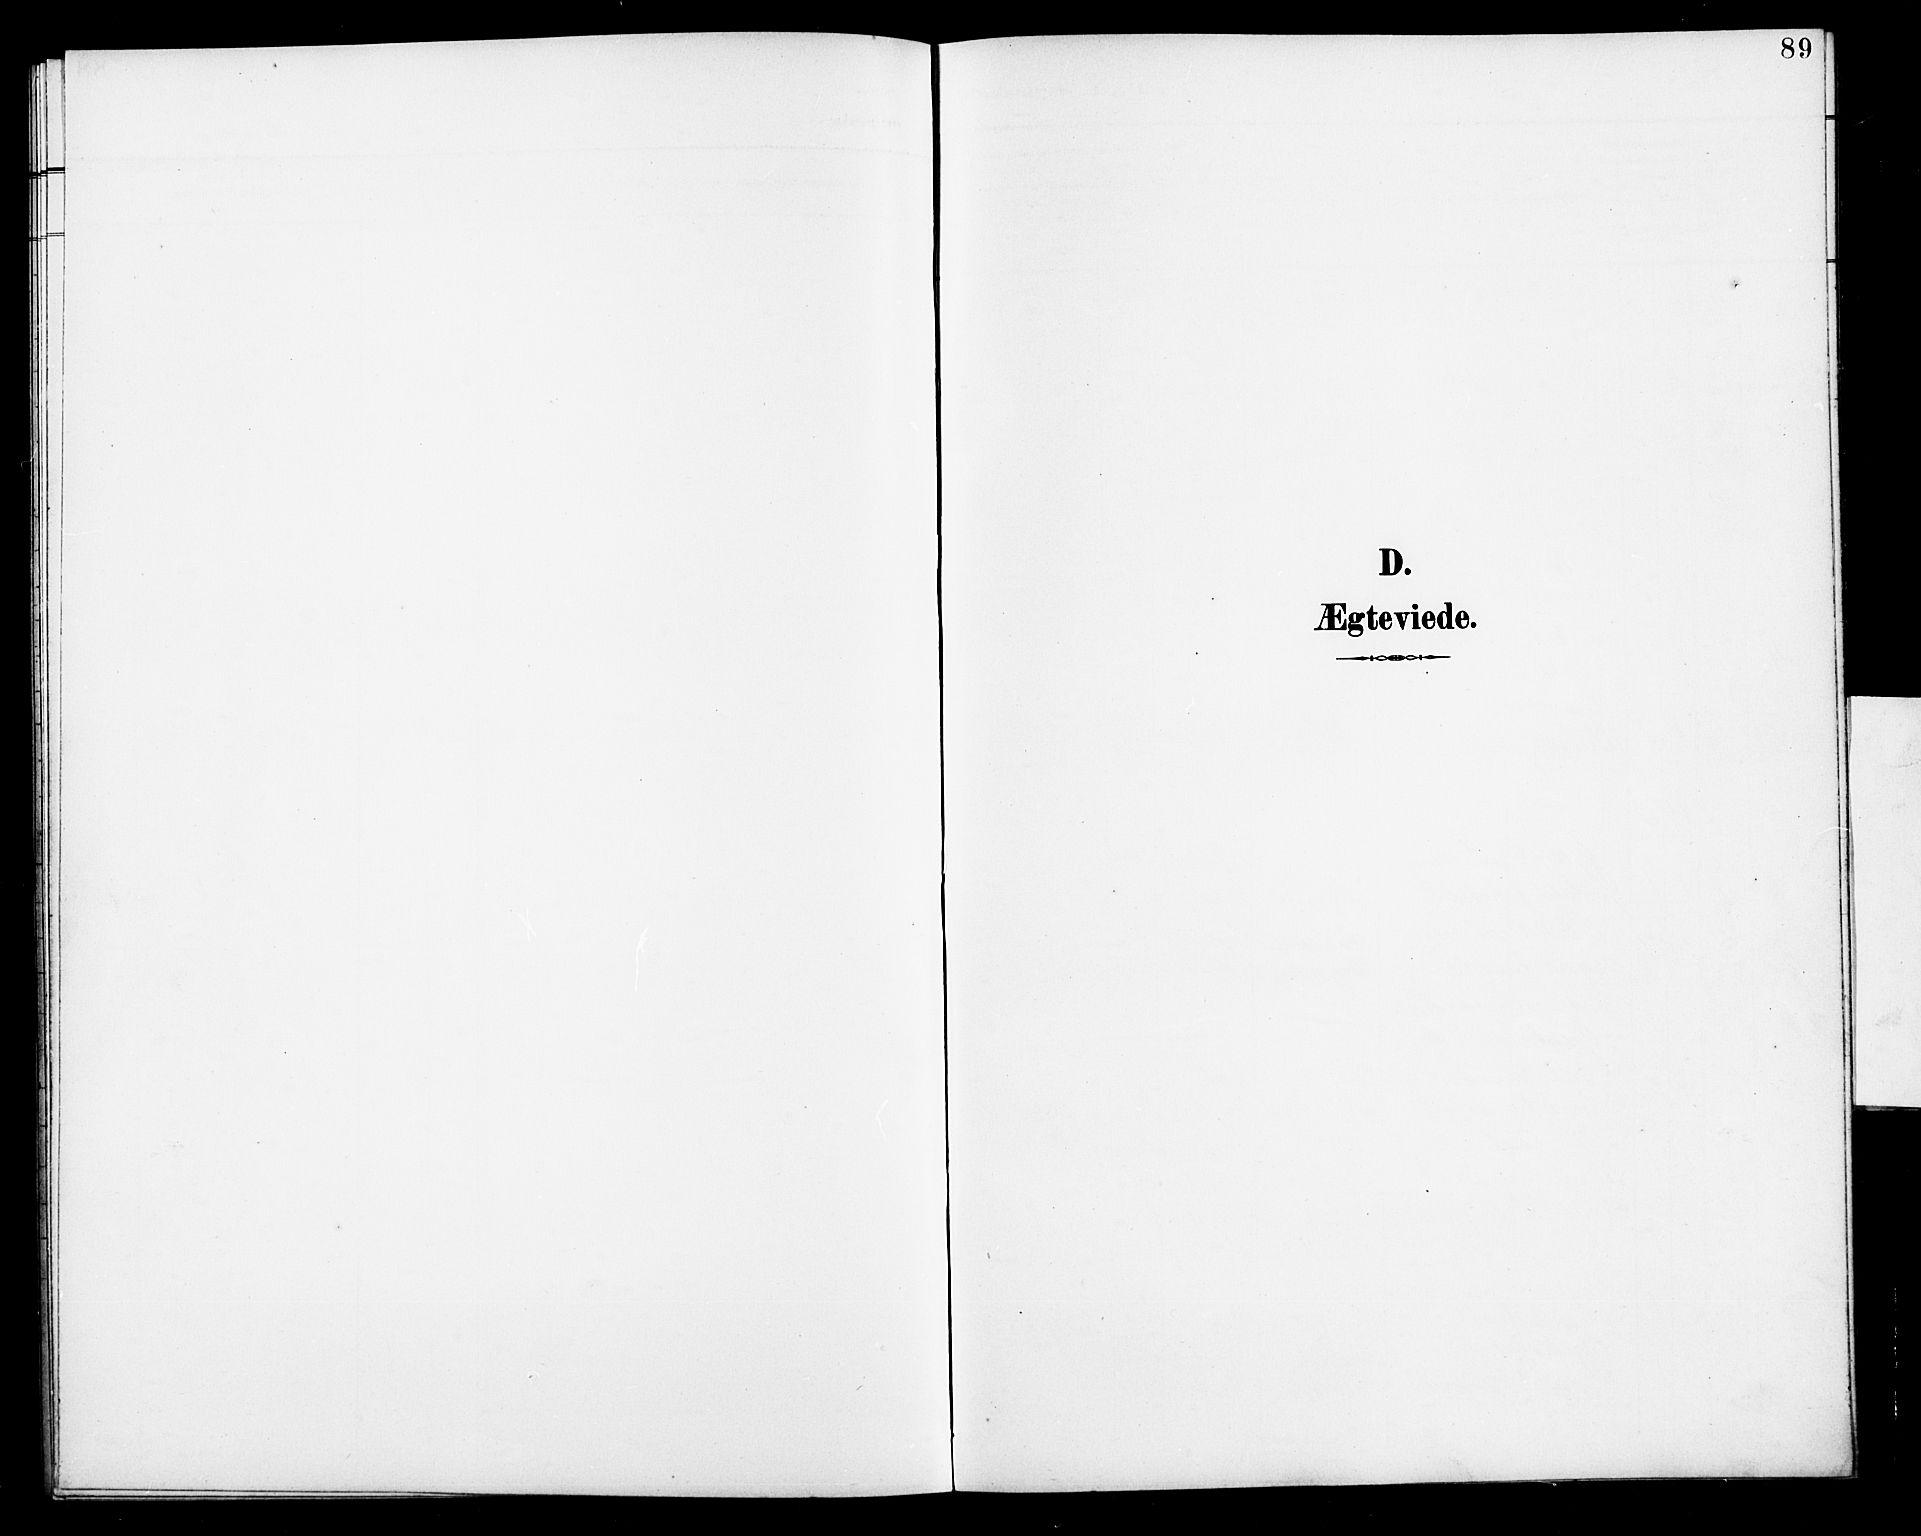 SAK, Herefoss sokneprestkontor, F/Fb/Fbb/L0003: Klokkerbok nr. B 3, 1892-1917, s. 89